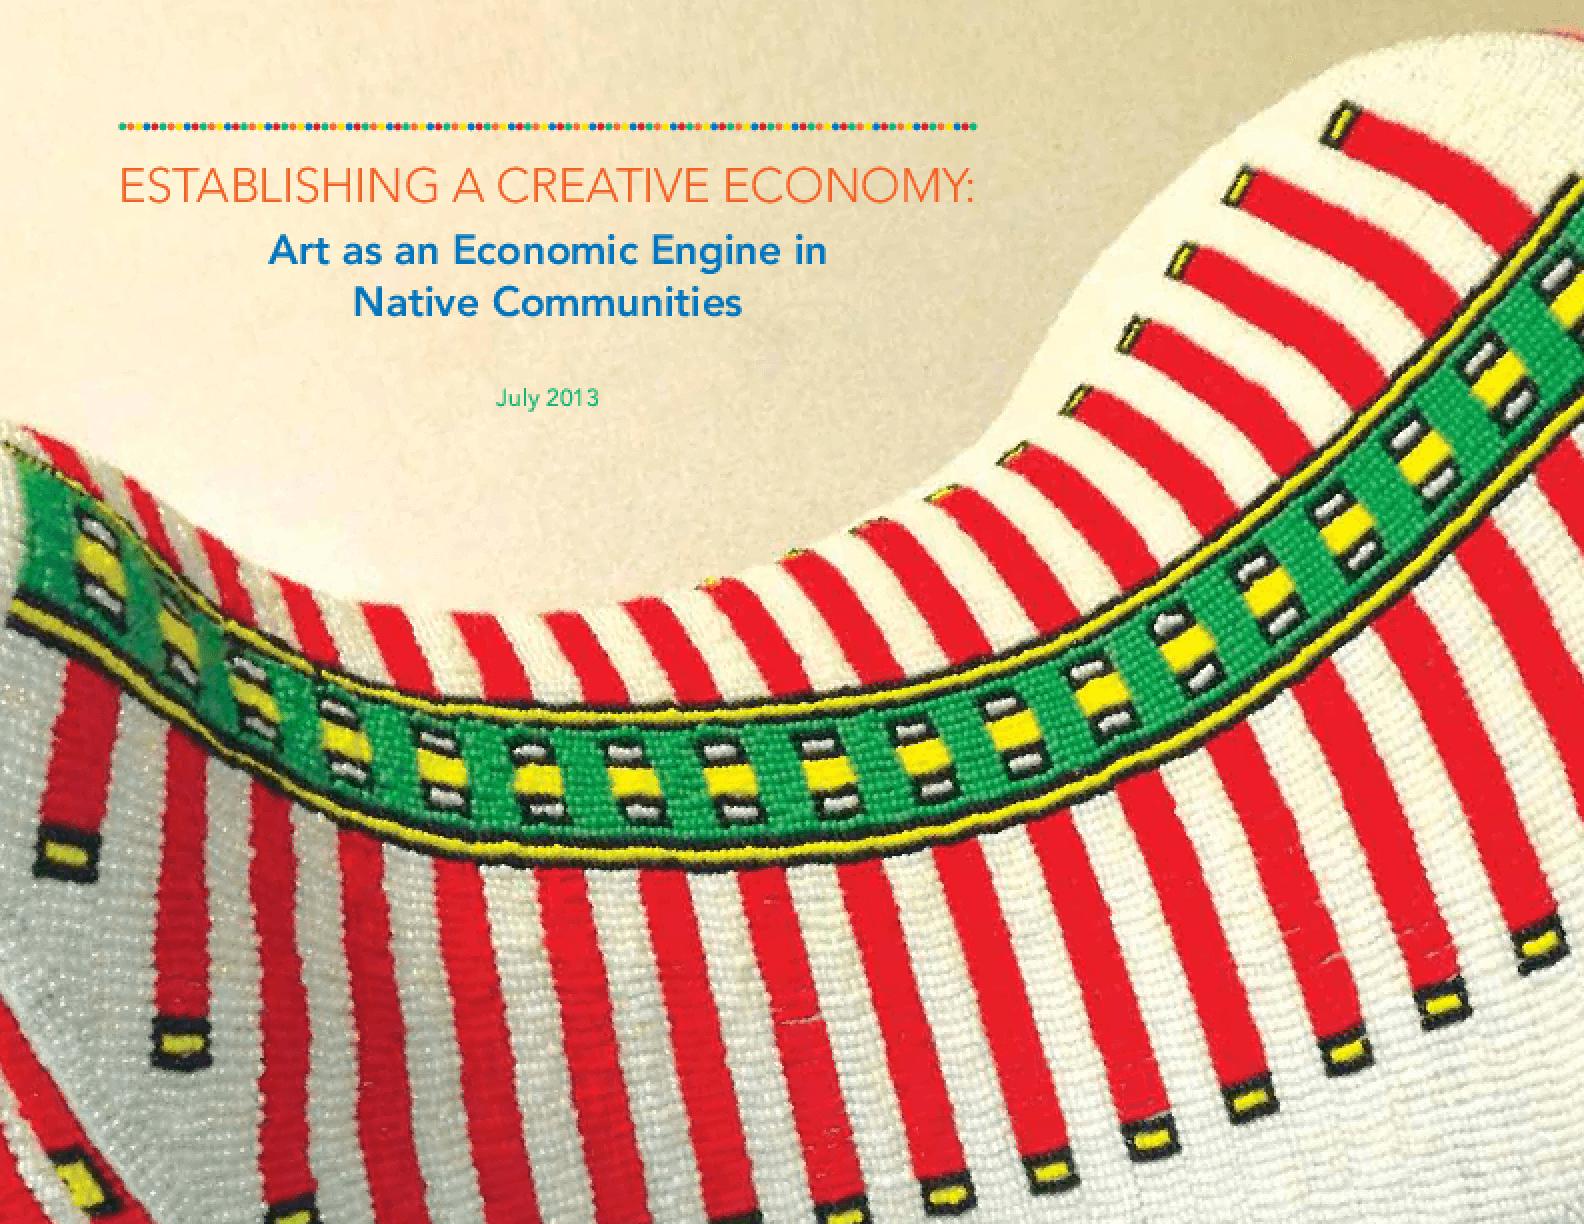 Establishing a Creative Community: Art as an Economic Engine in Native Communities